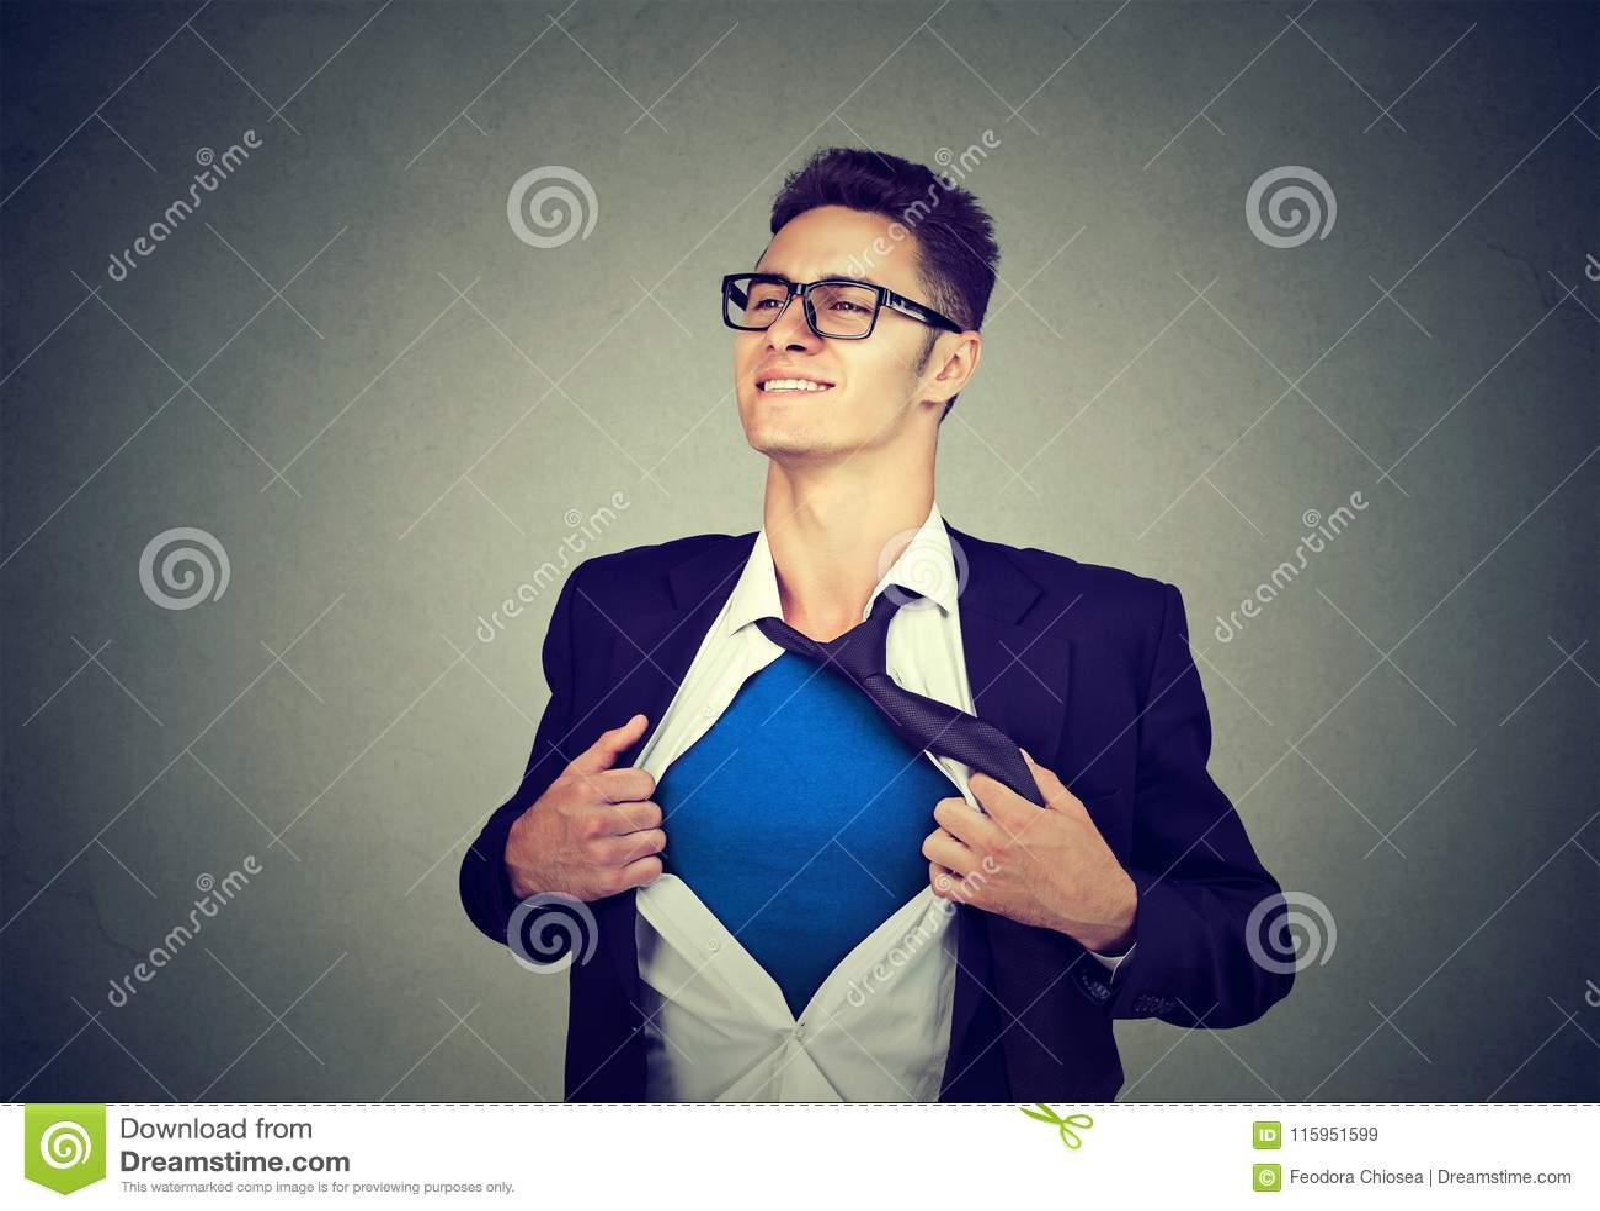 Hombre de negocios joven que actúa como un superhéroe que rasga su camisa apagado